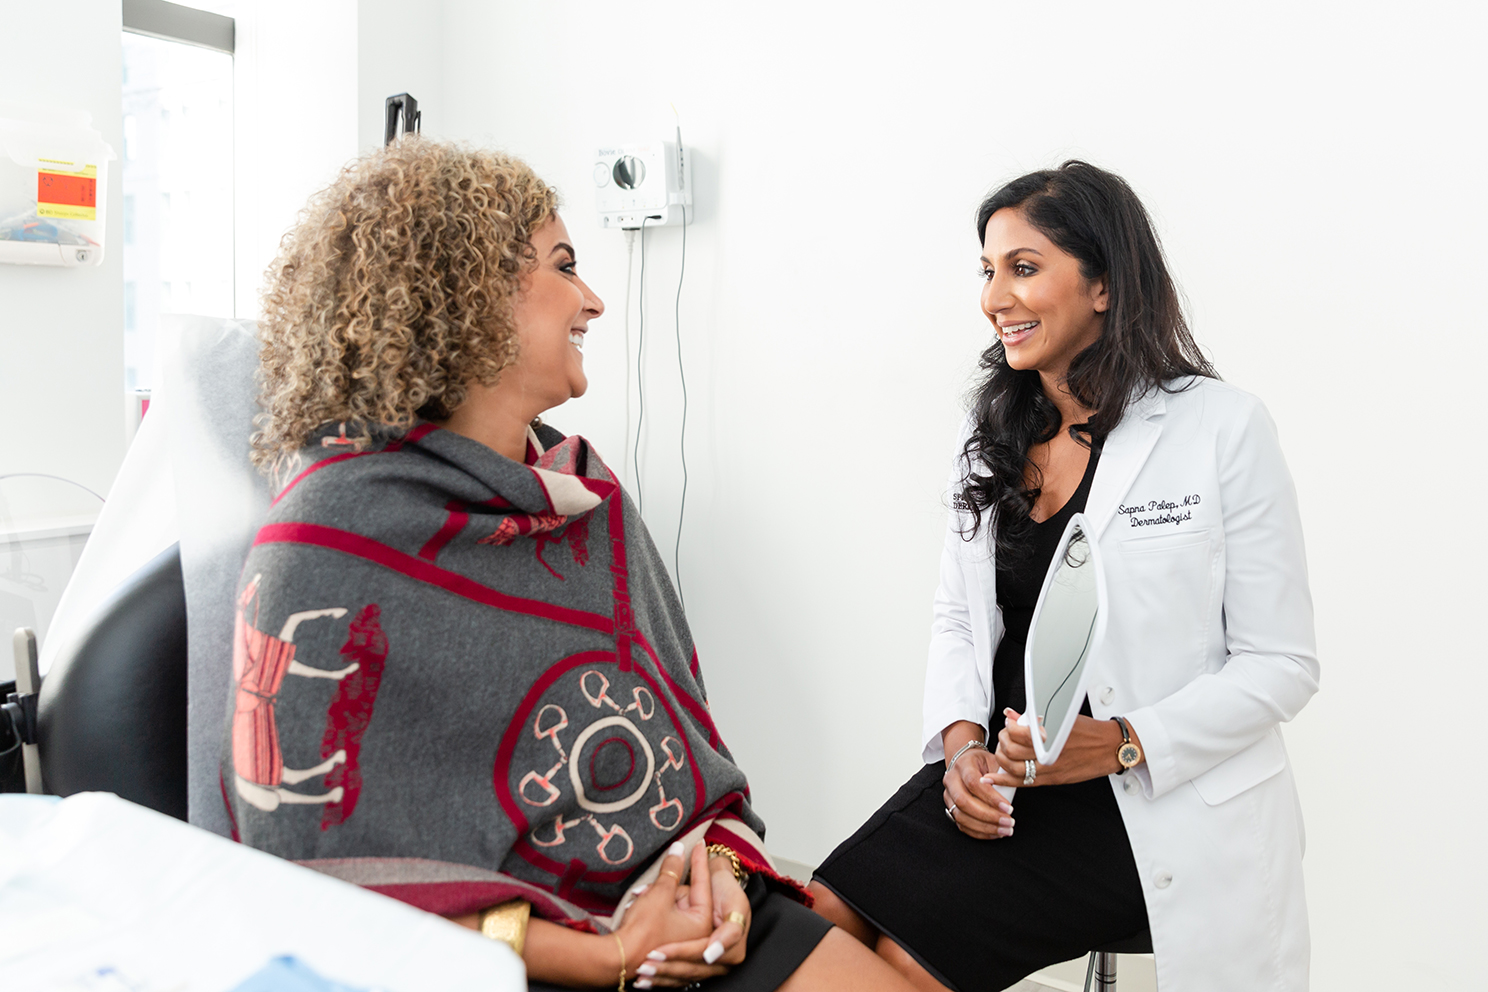 Secret RF wrinkle treatment consult at Spring Street Dermatology in New York City